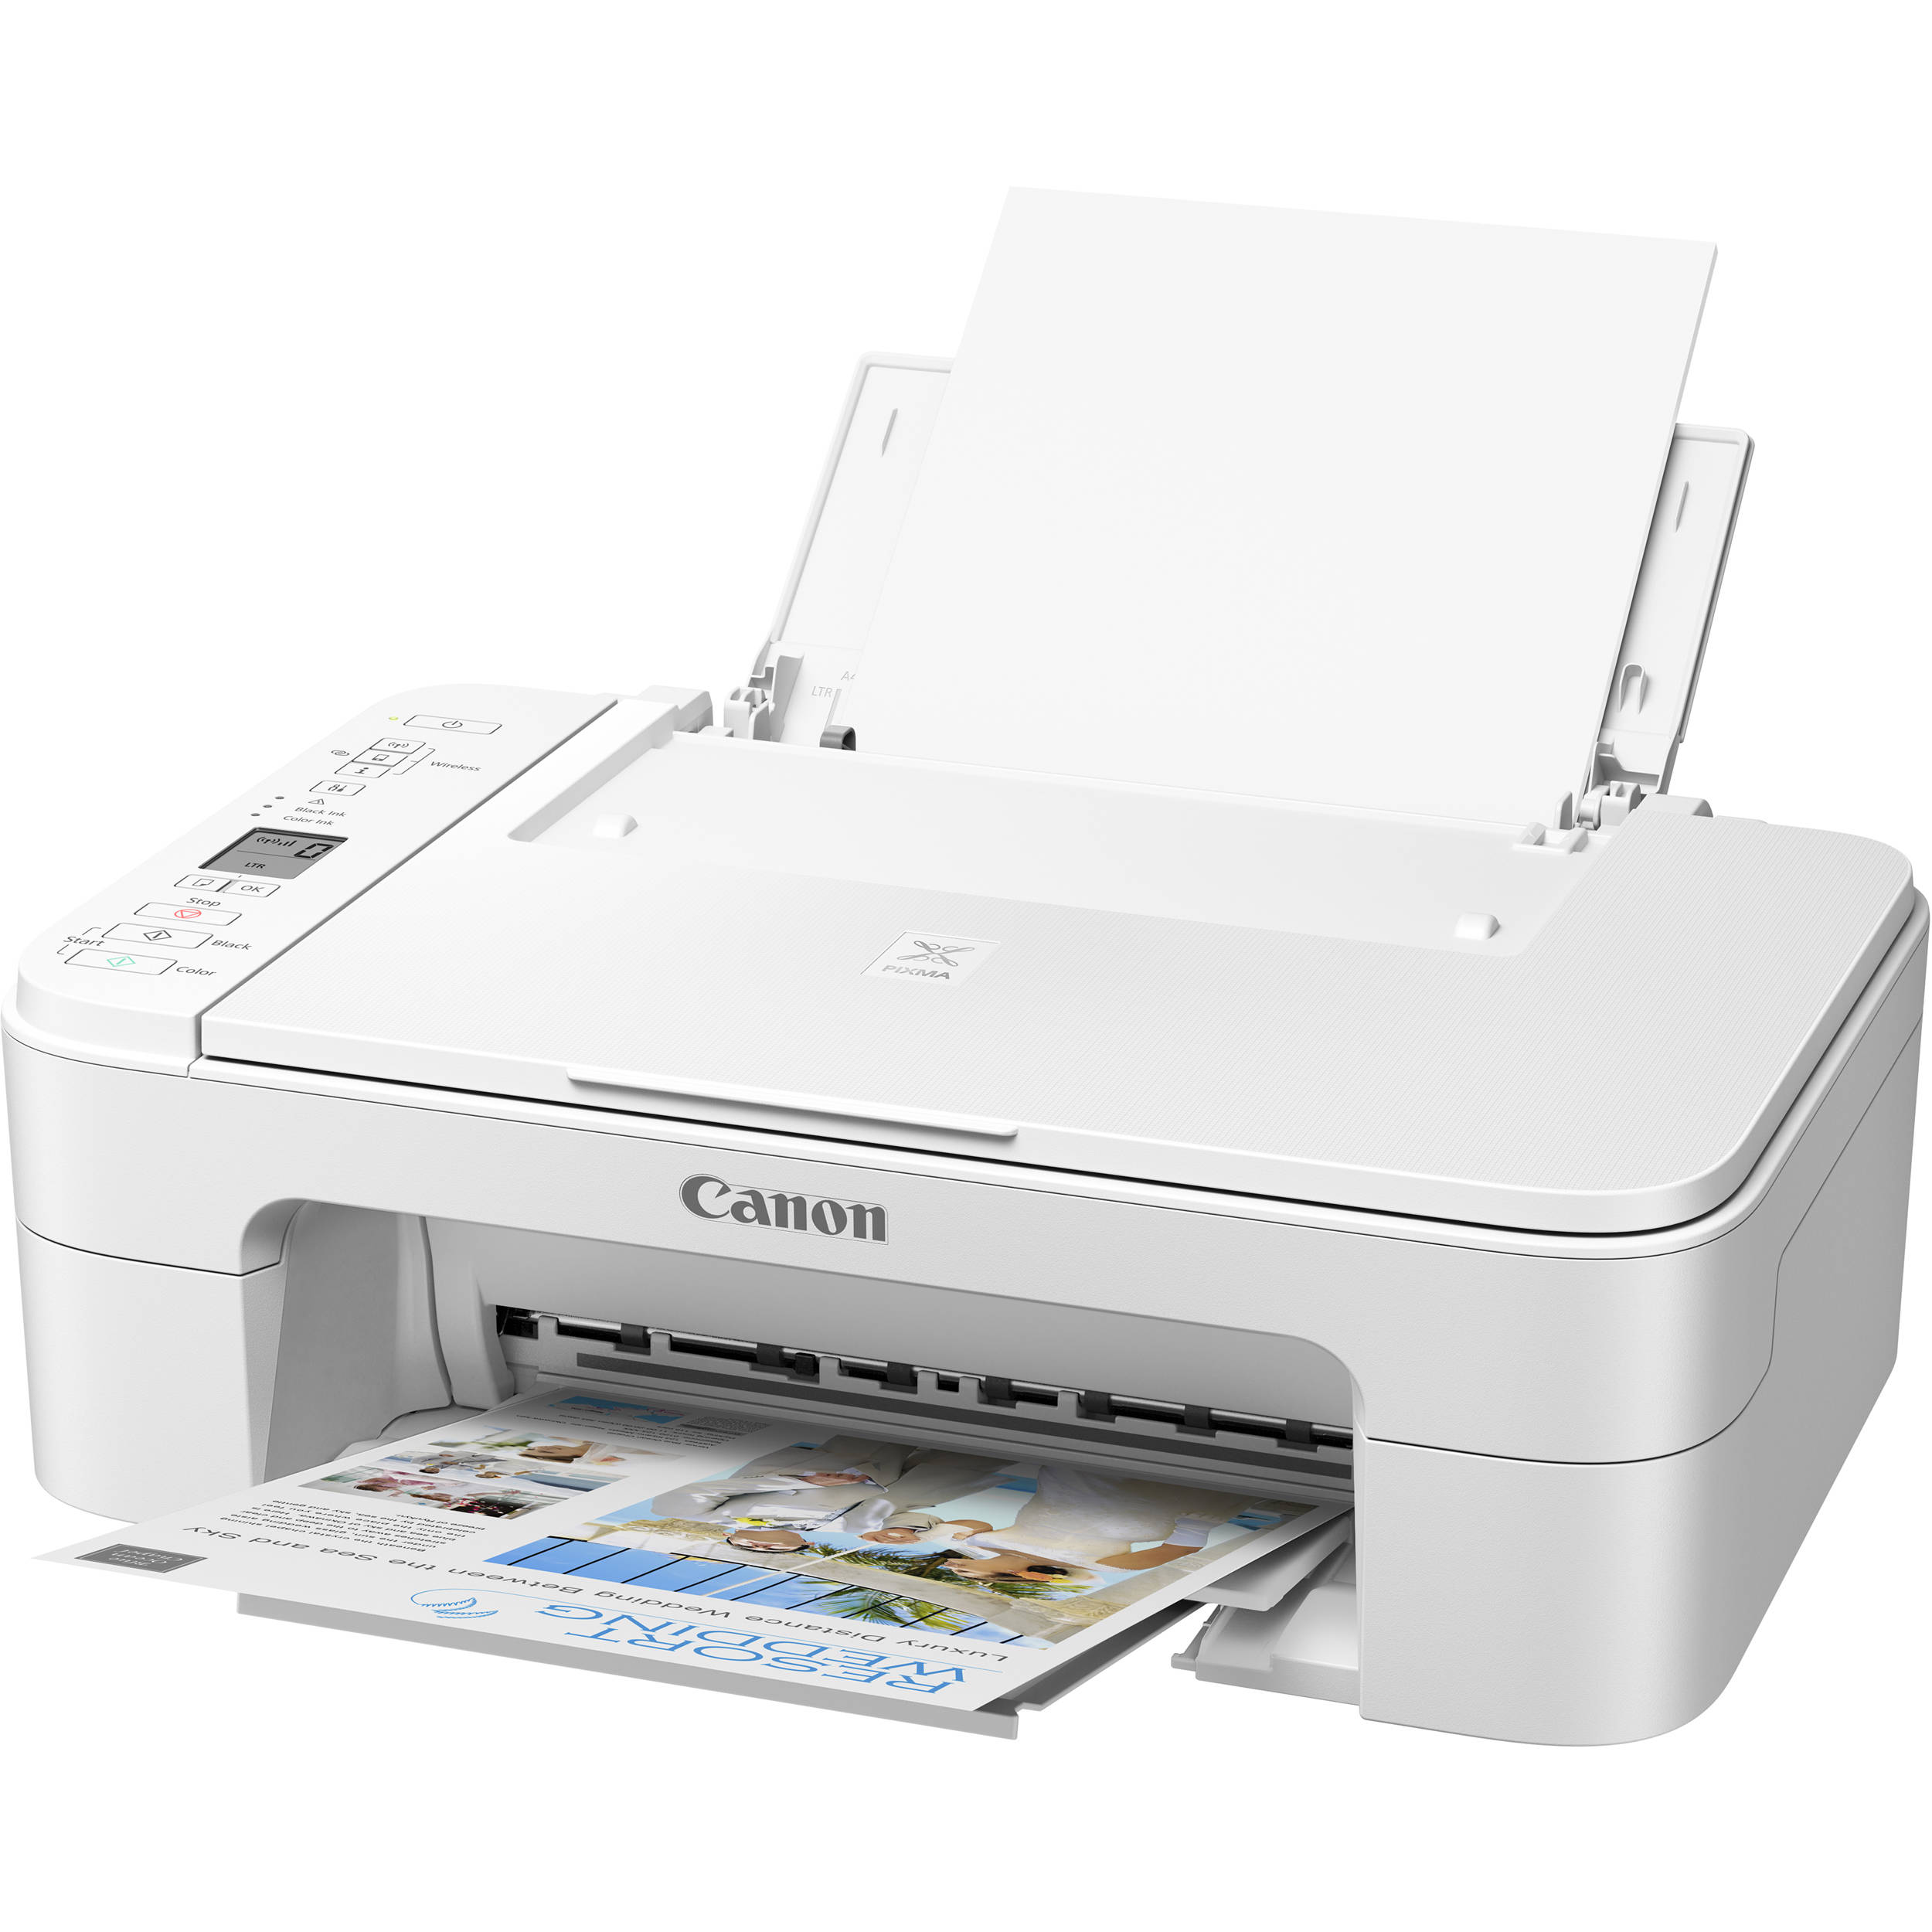 Canon PIXMA 490 Wirelss Printer All In One Printing Copier Scanner /& Fax Machine